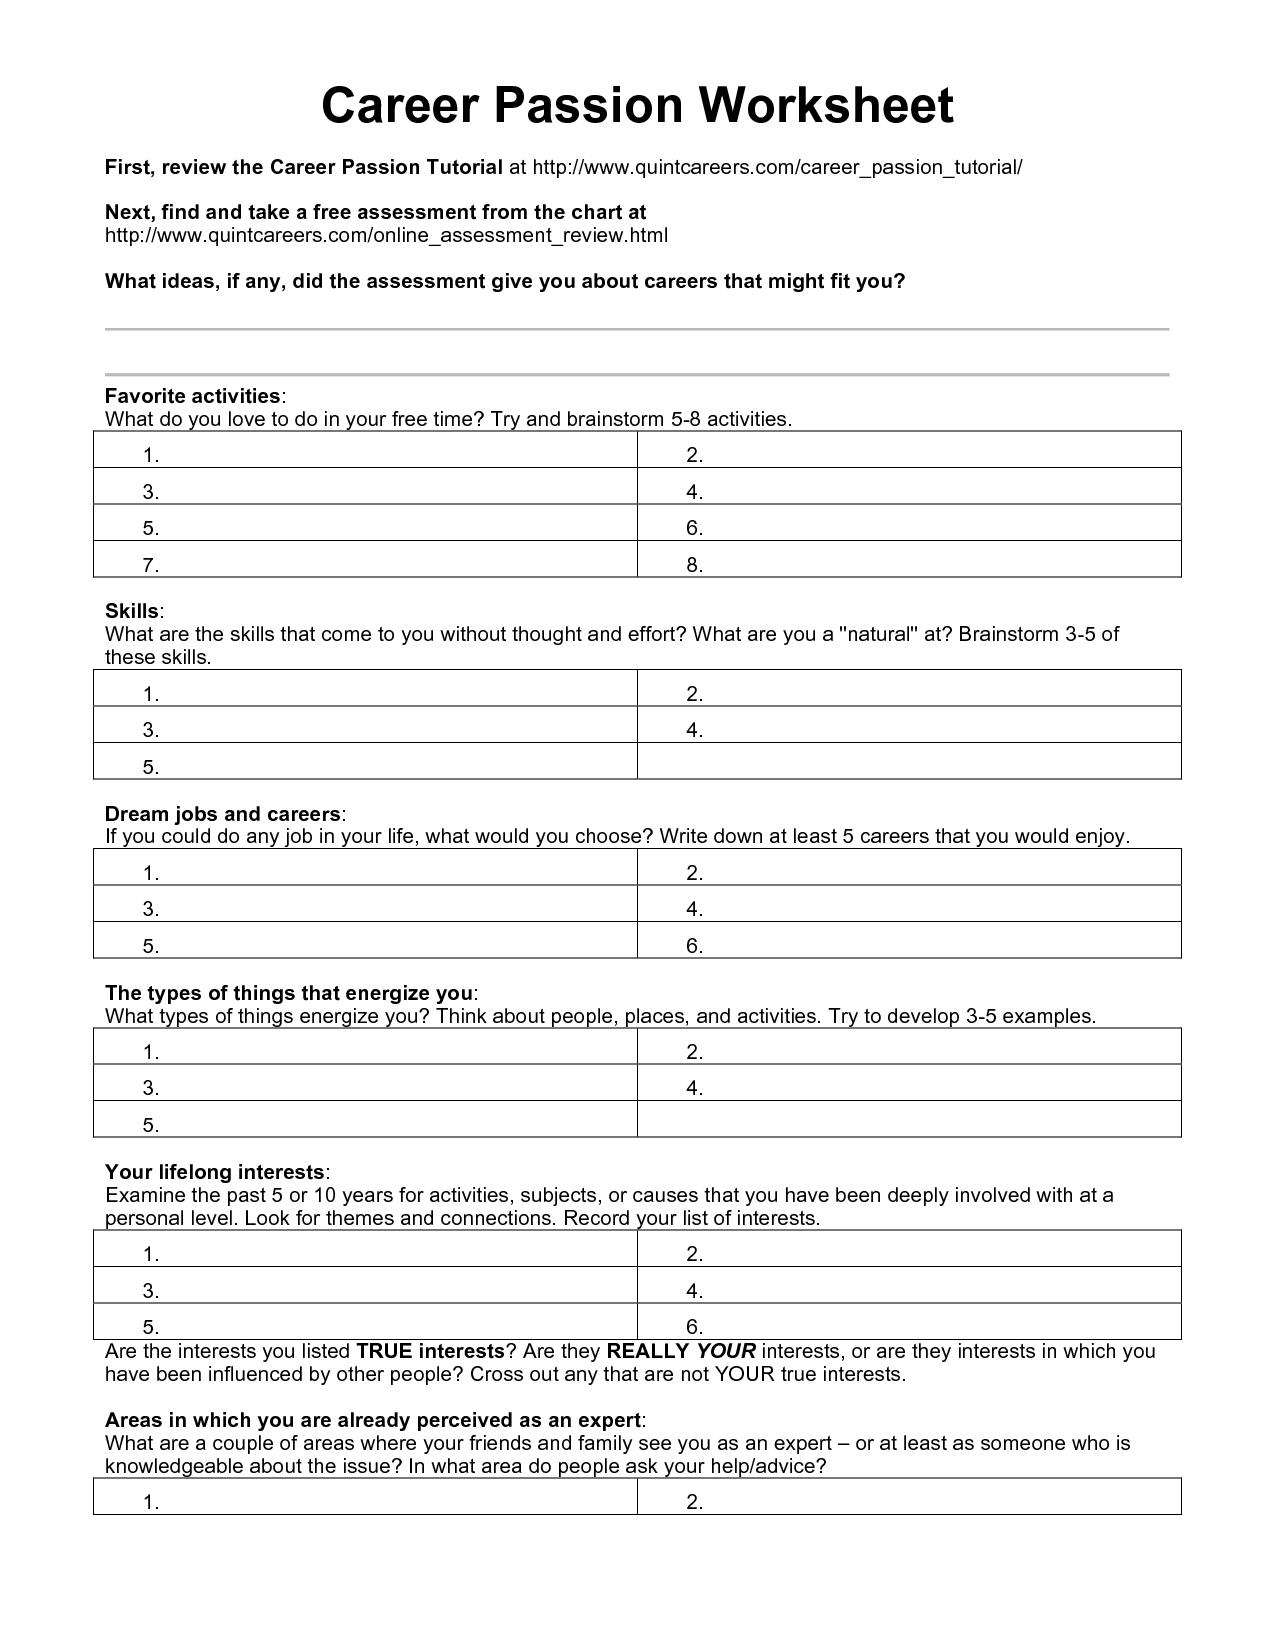 job search action plan livmoore tk job search action plan 23 04 2017